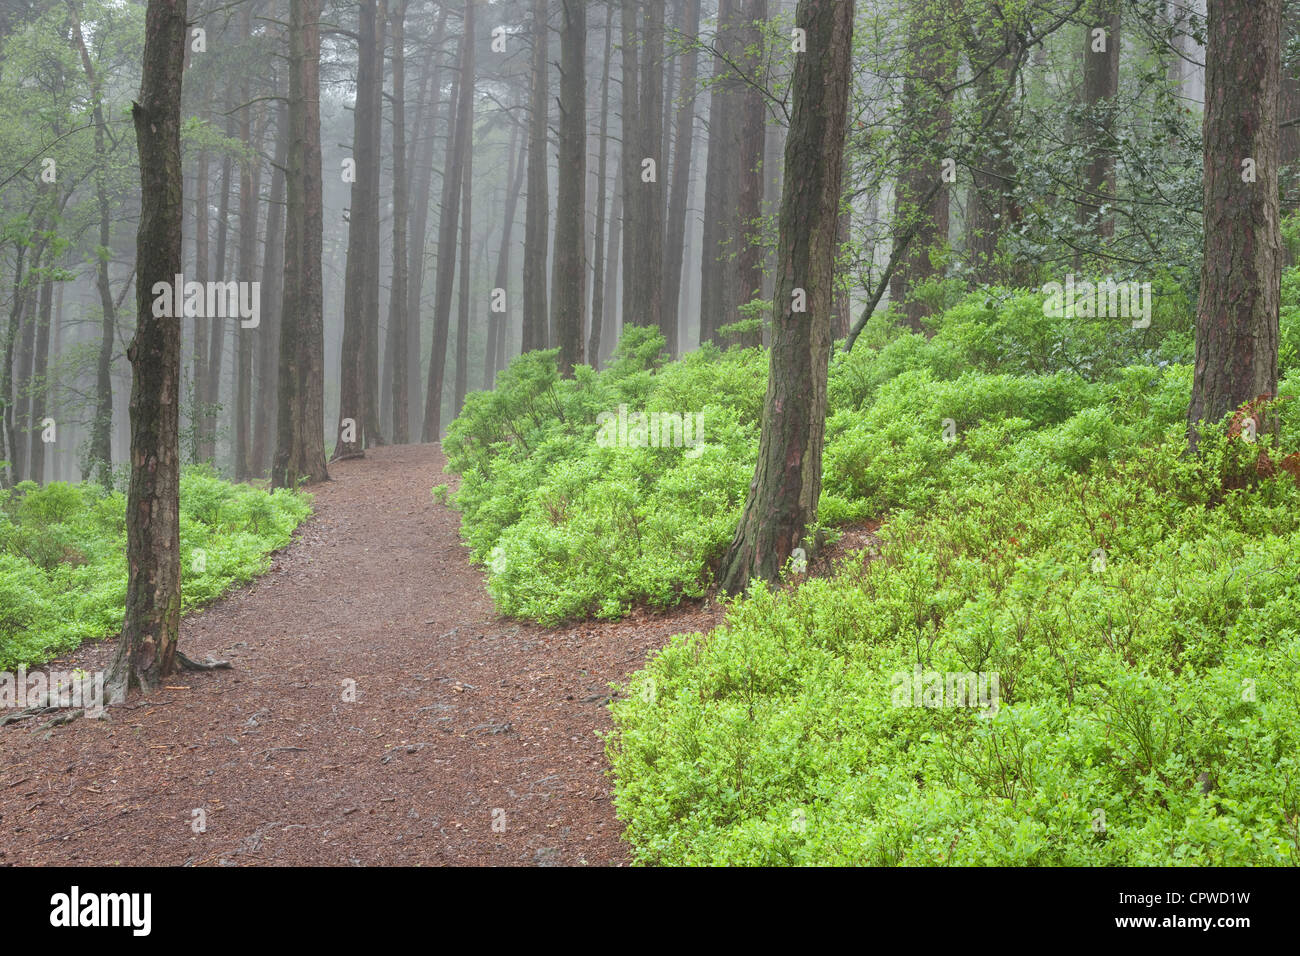 Conifer woodland in mist with blueberry bushes, England, UK - Stock Image